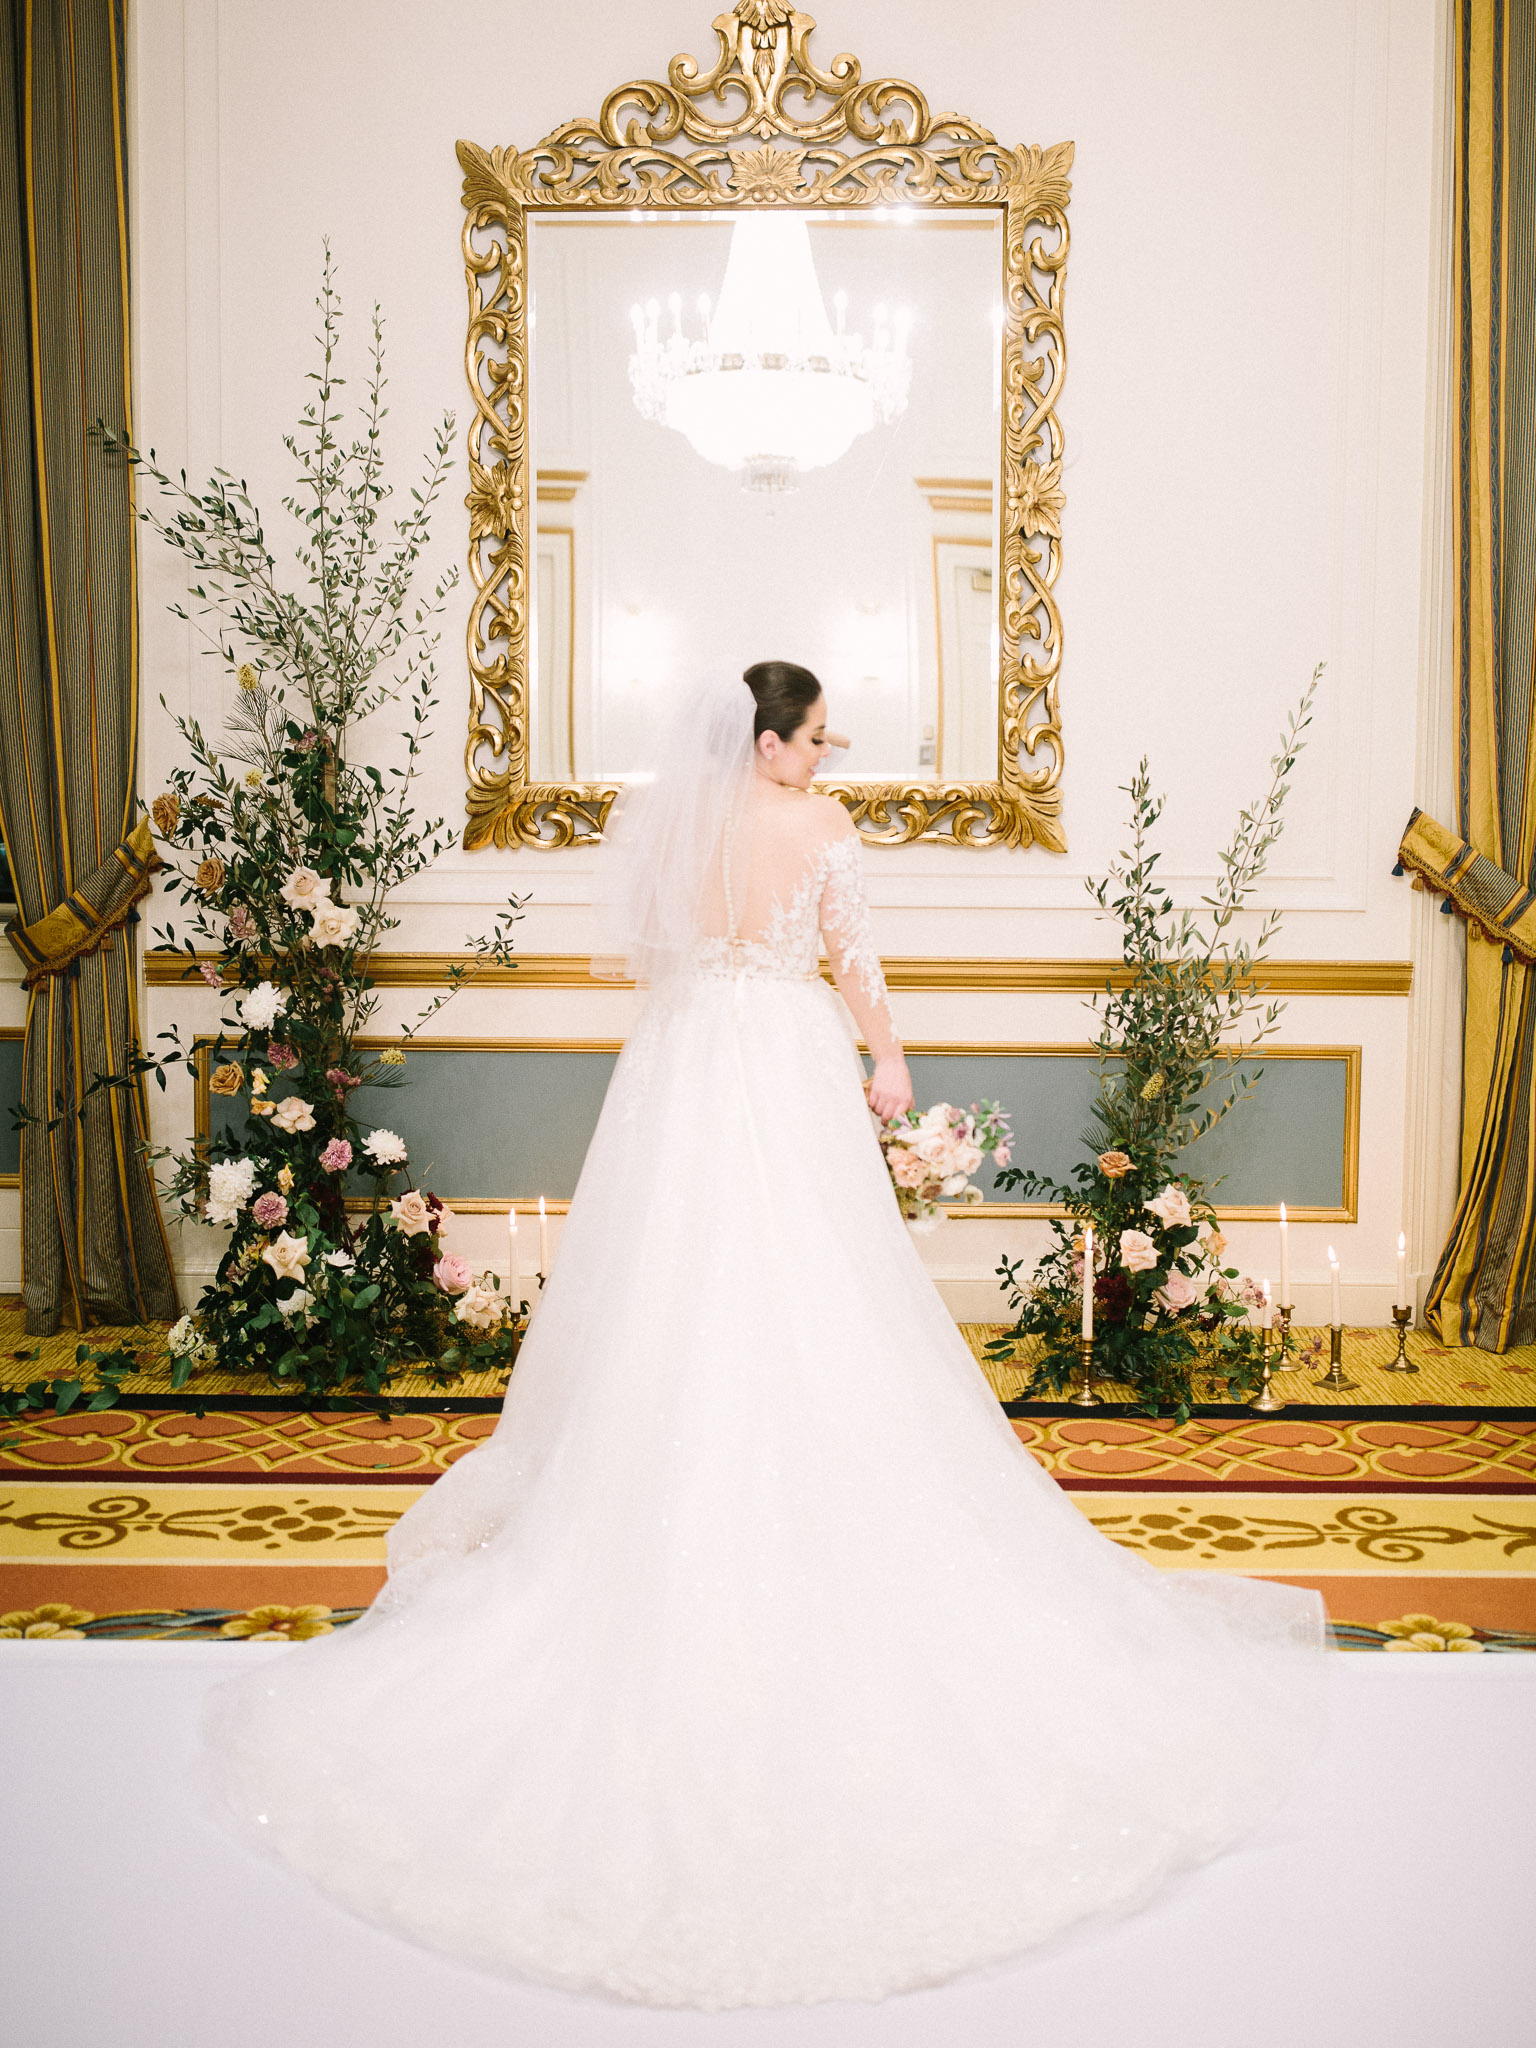 Hanna&Jordan Wedding_HotelVancouver_9413.jpg